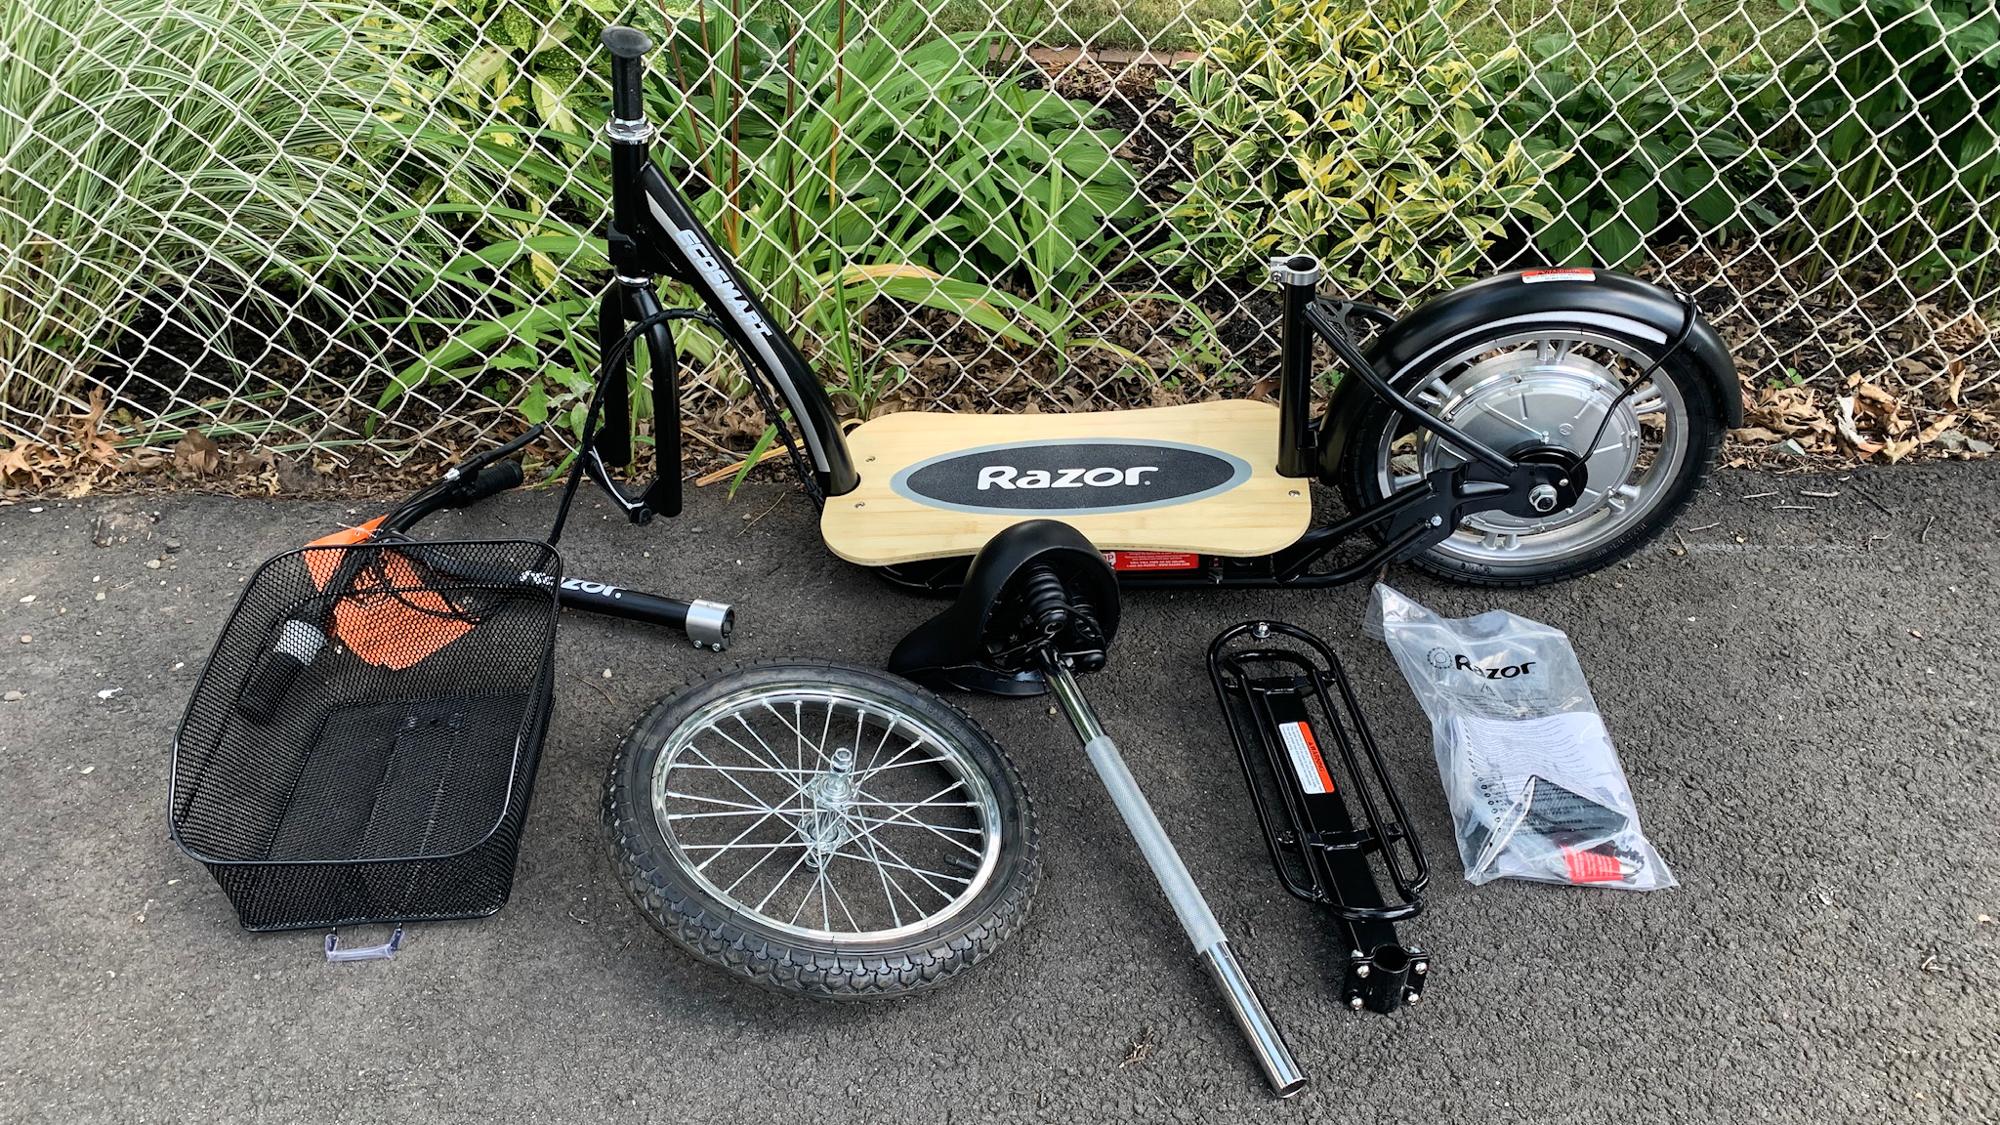 Razor EcoSmart Metro HD electric scooter review